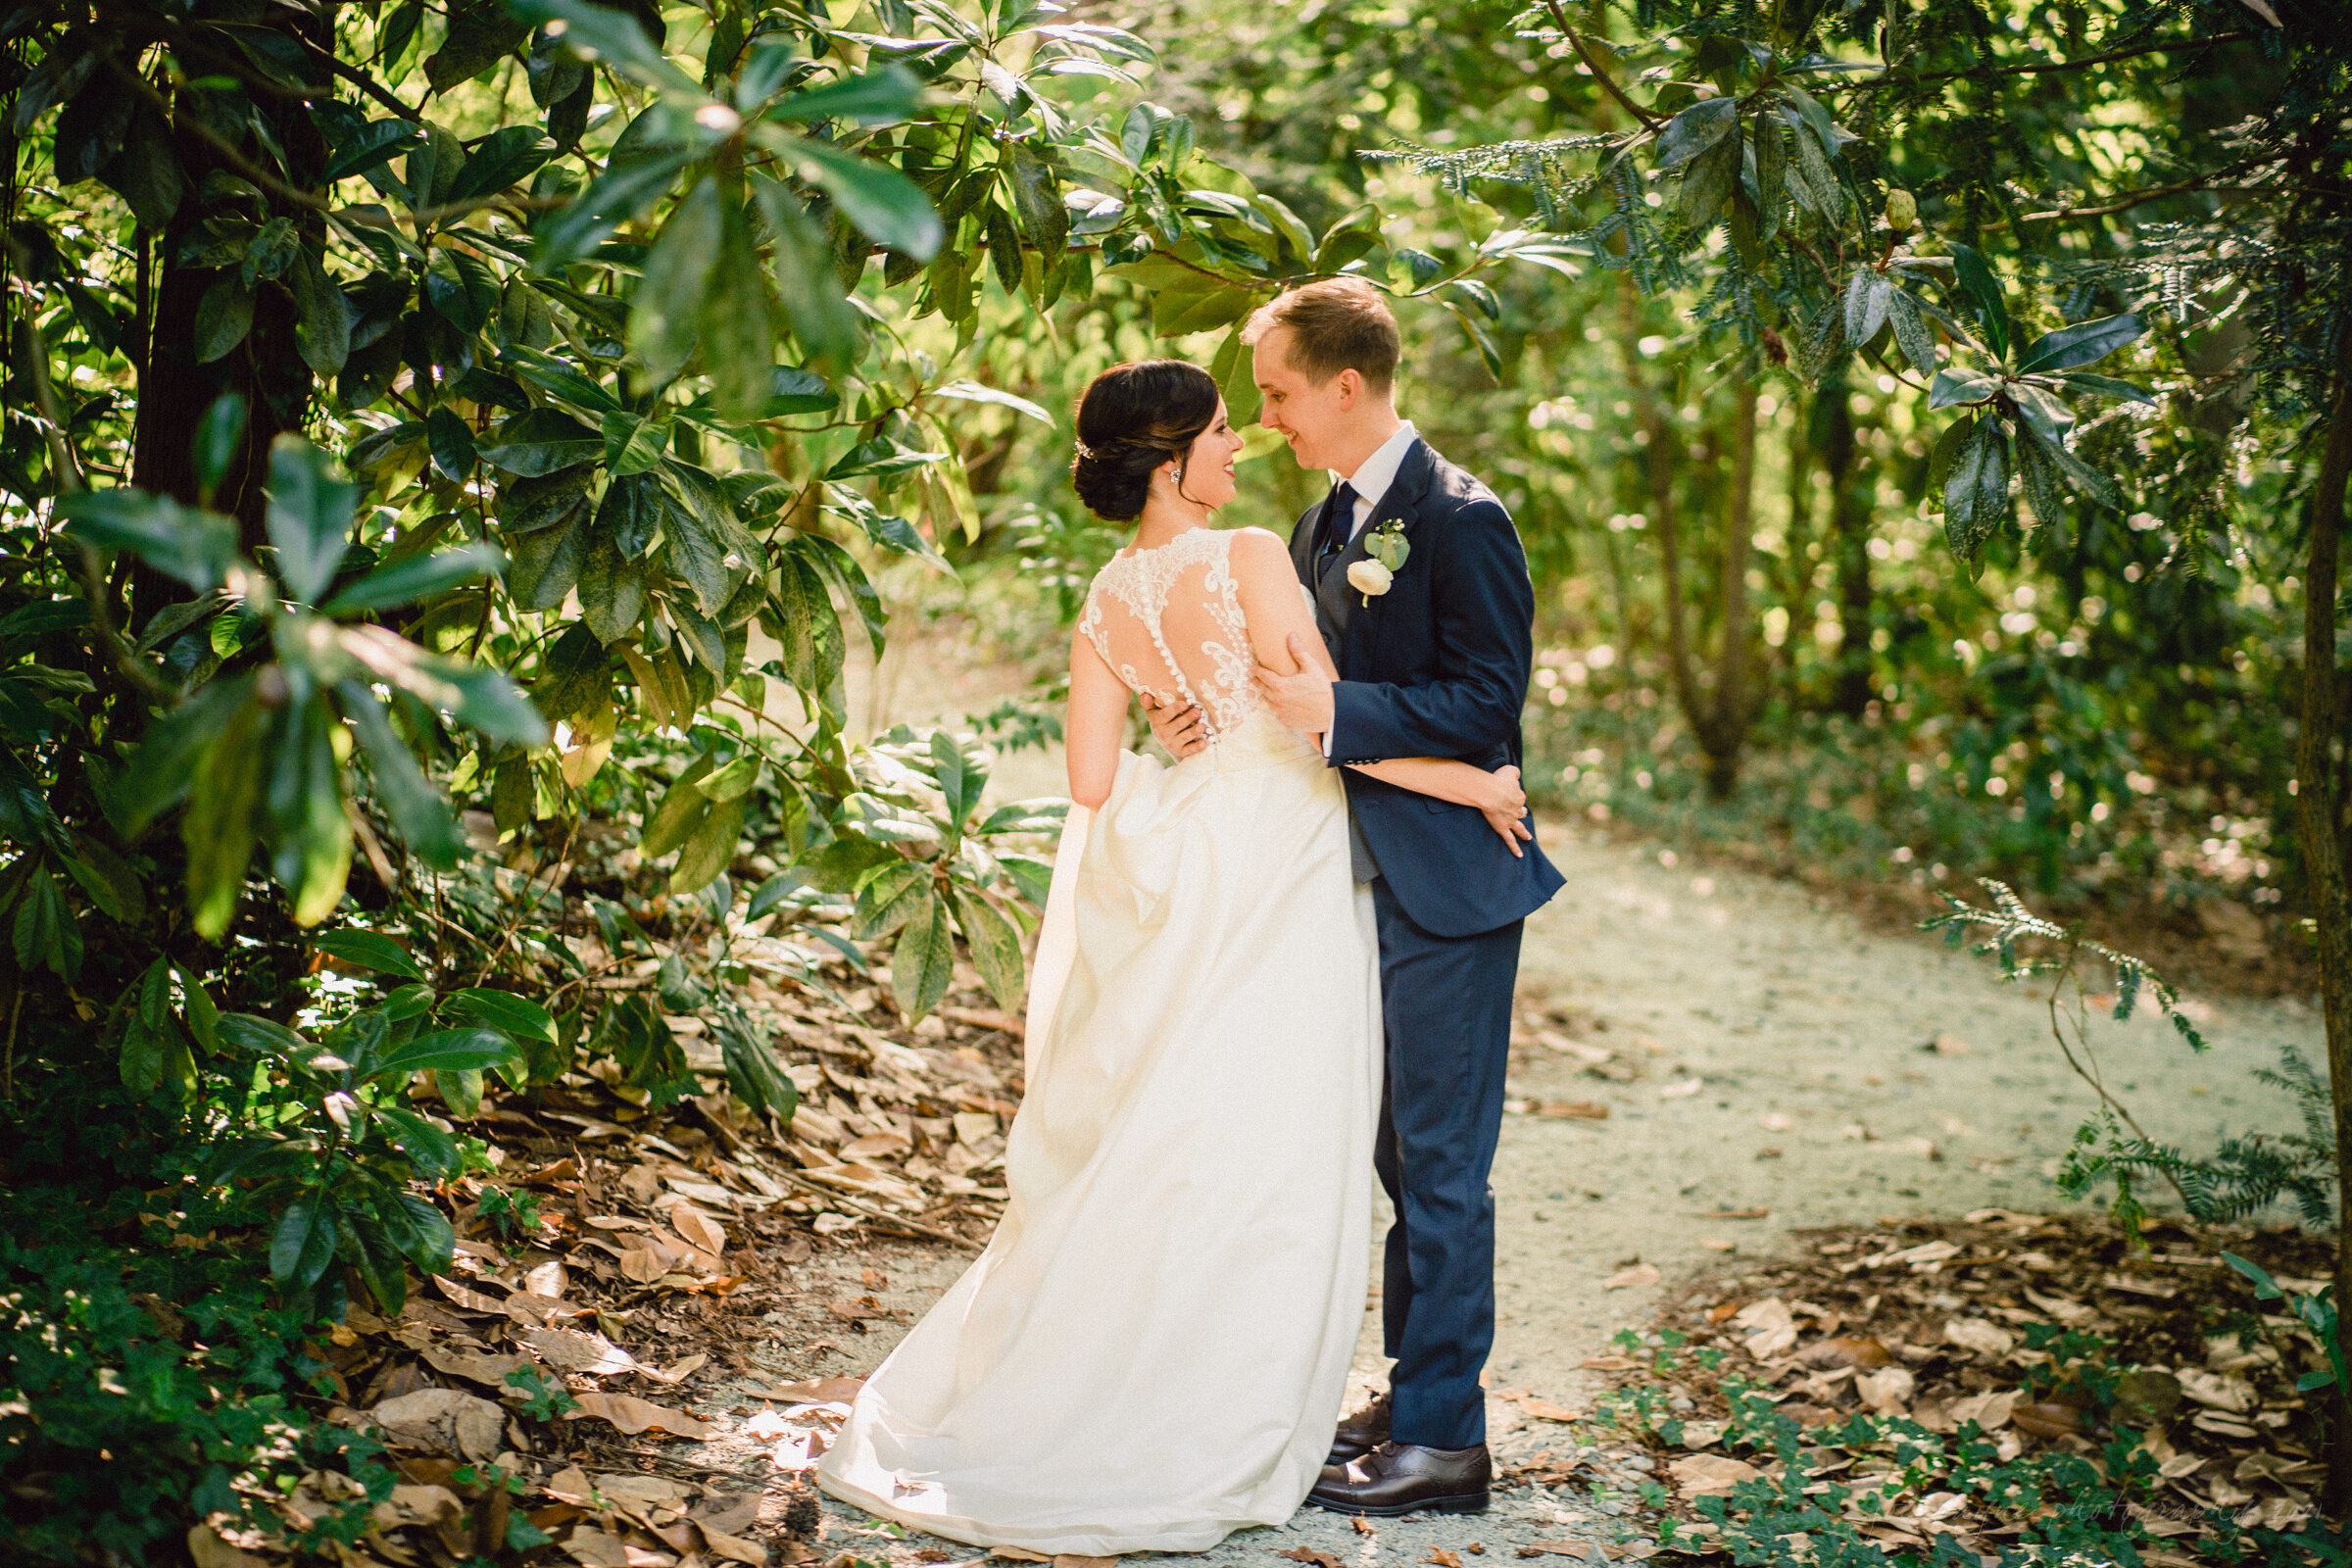 Cotton Room Wedding Photographer Kate Martin 1 5